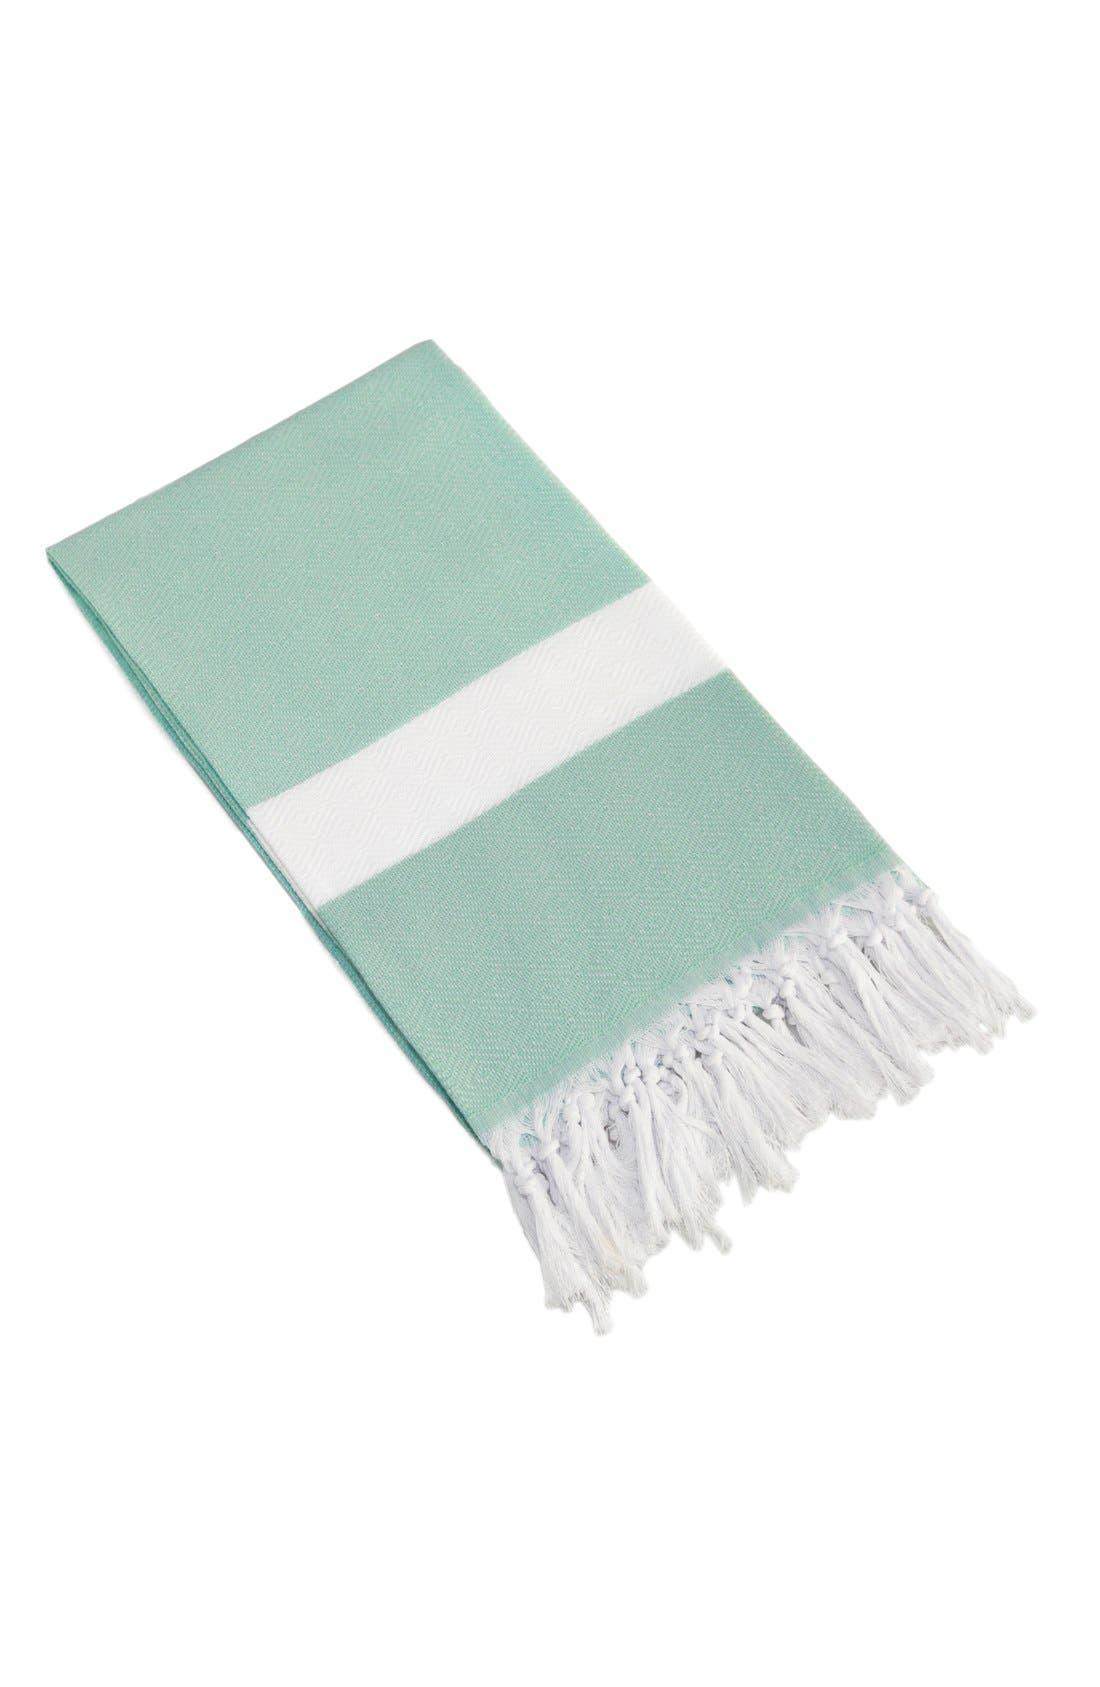 Main Image - Linum Home Textiles 'Diamond' Turkish Pestemal Towel